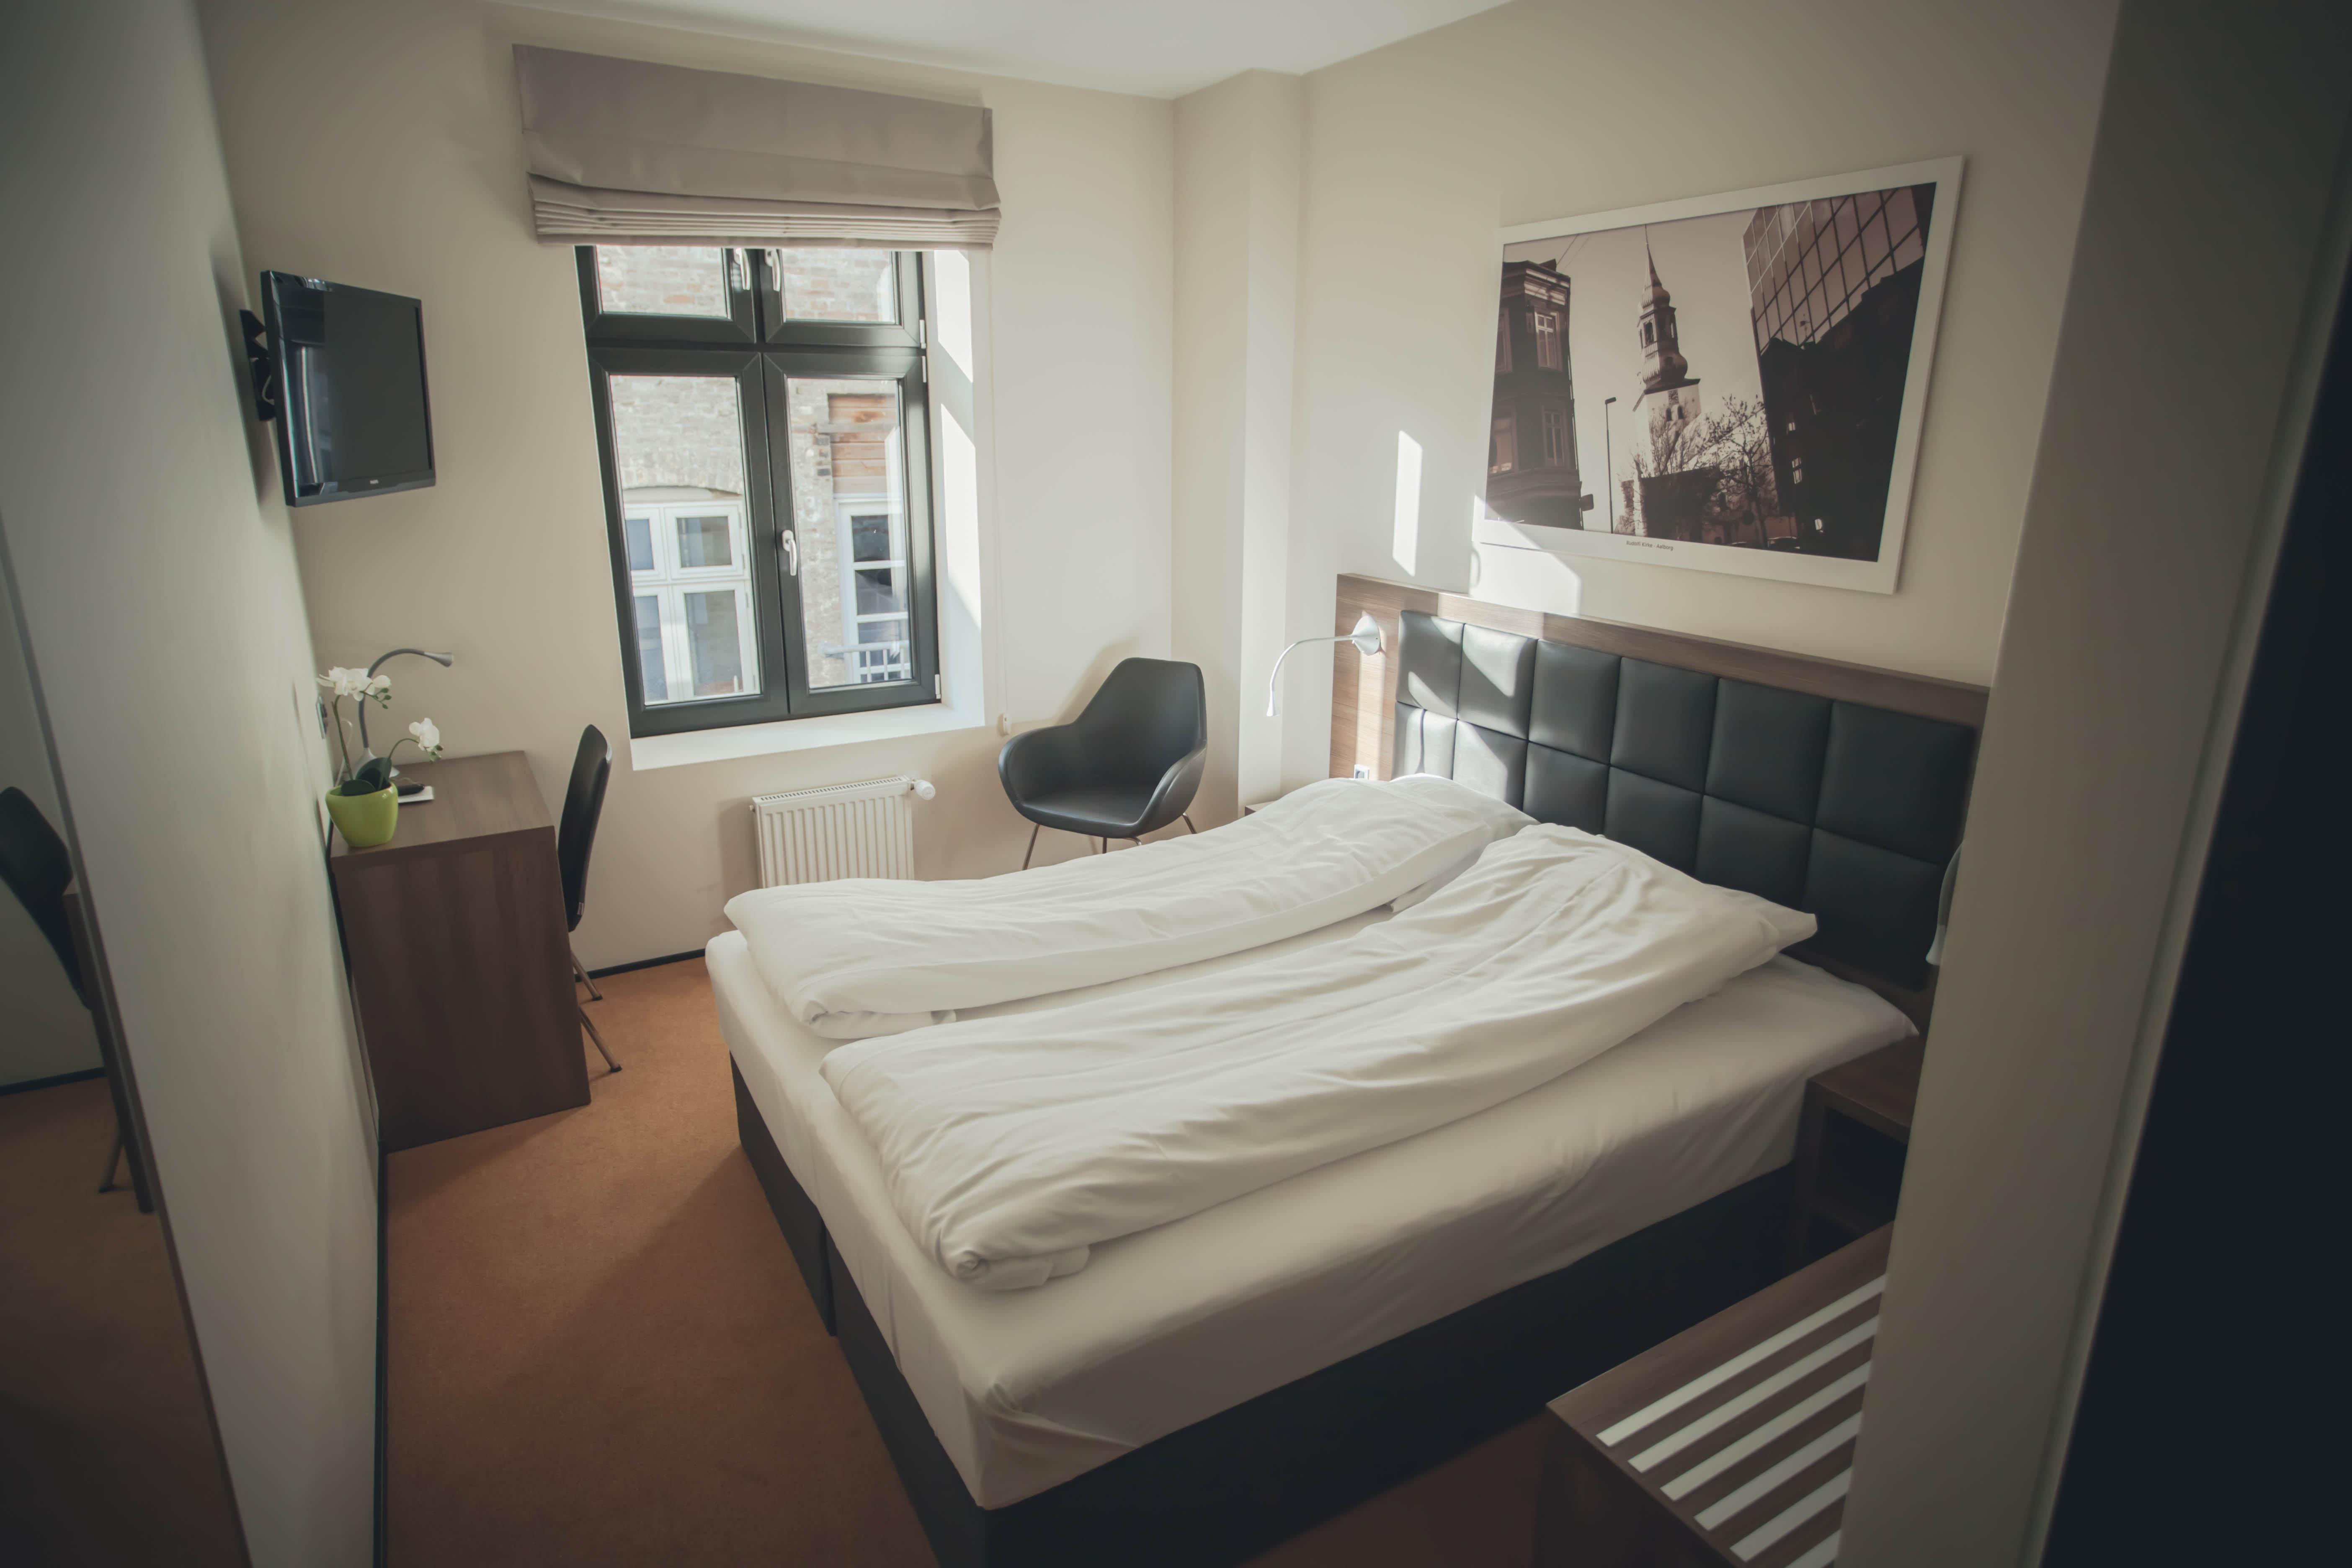 Hotel Jomfru Ane-40